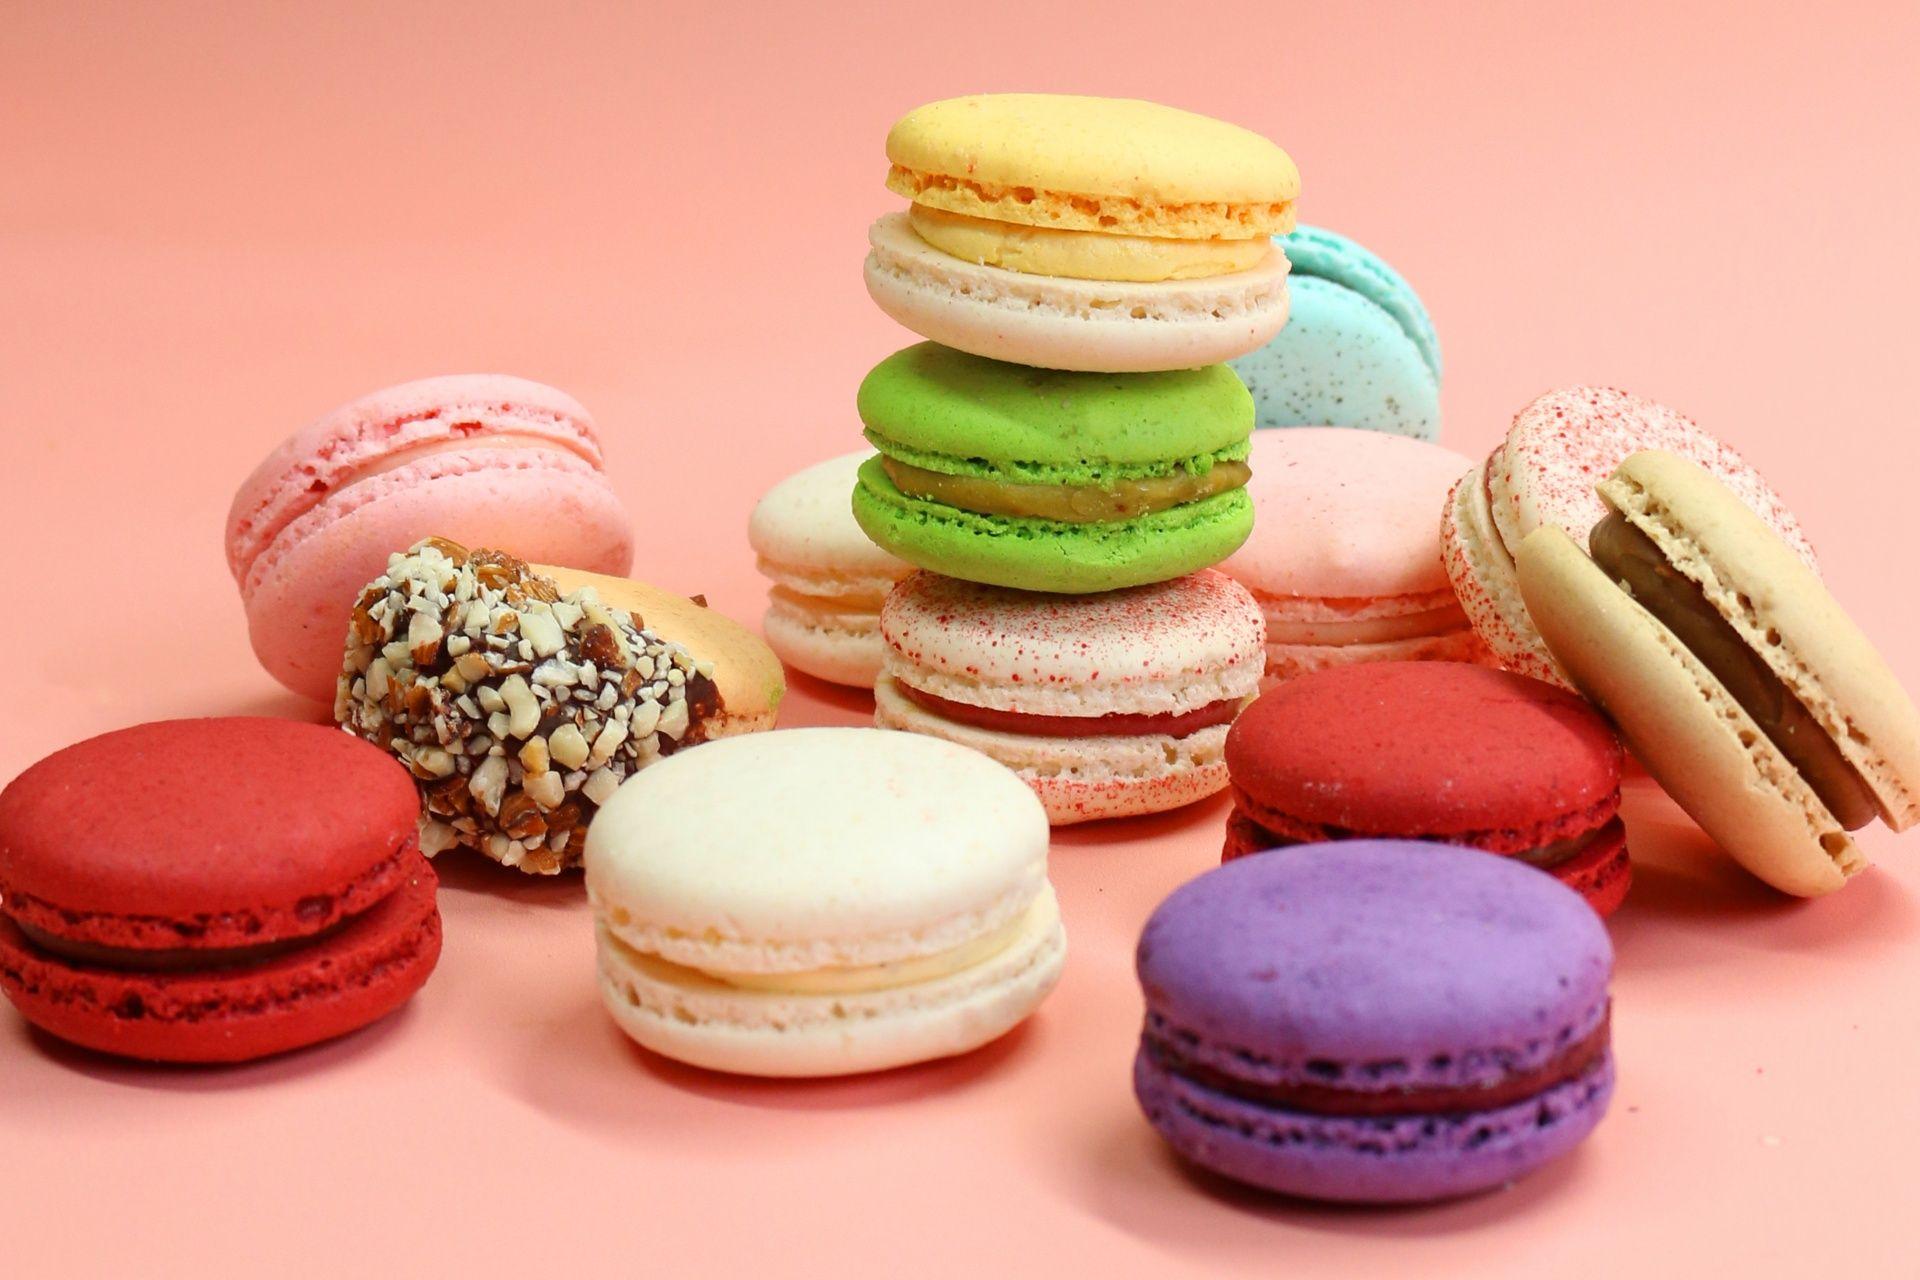 Bizu's Macaron de Paris